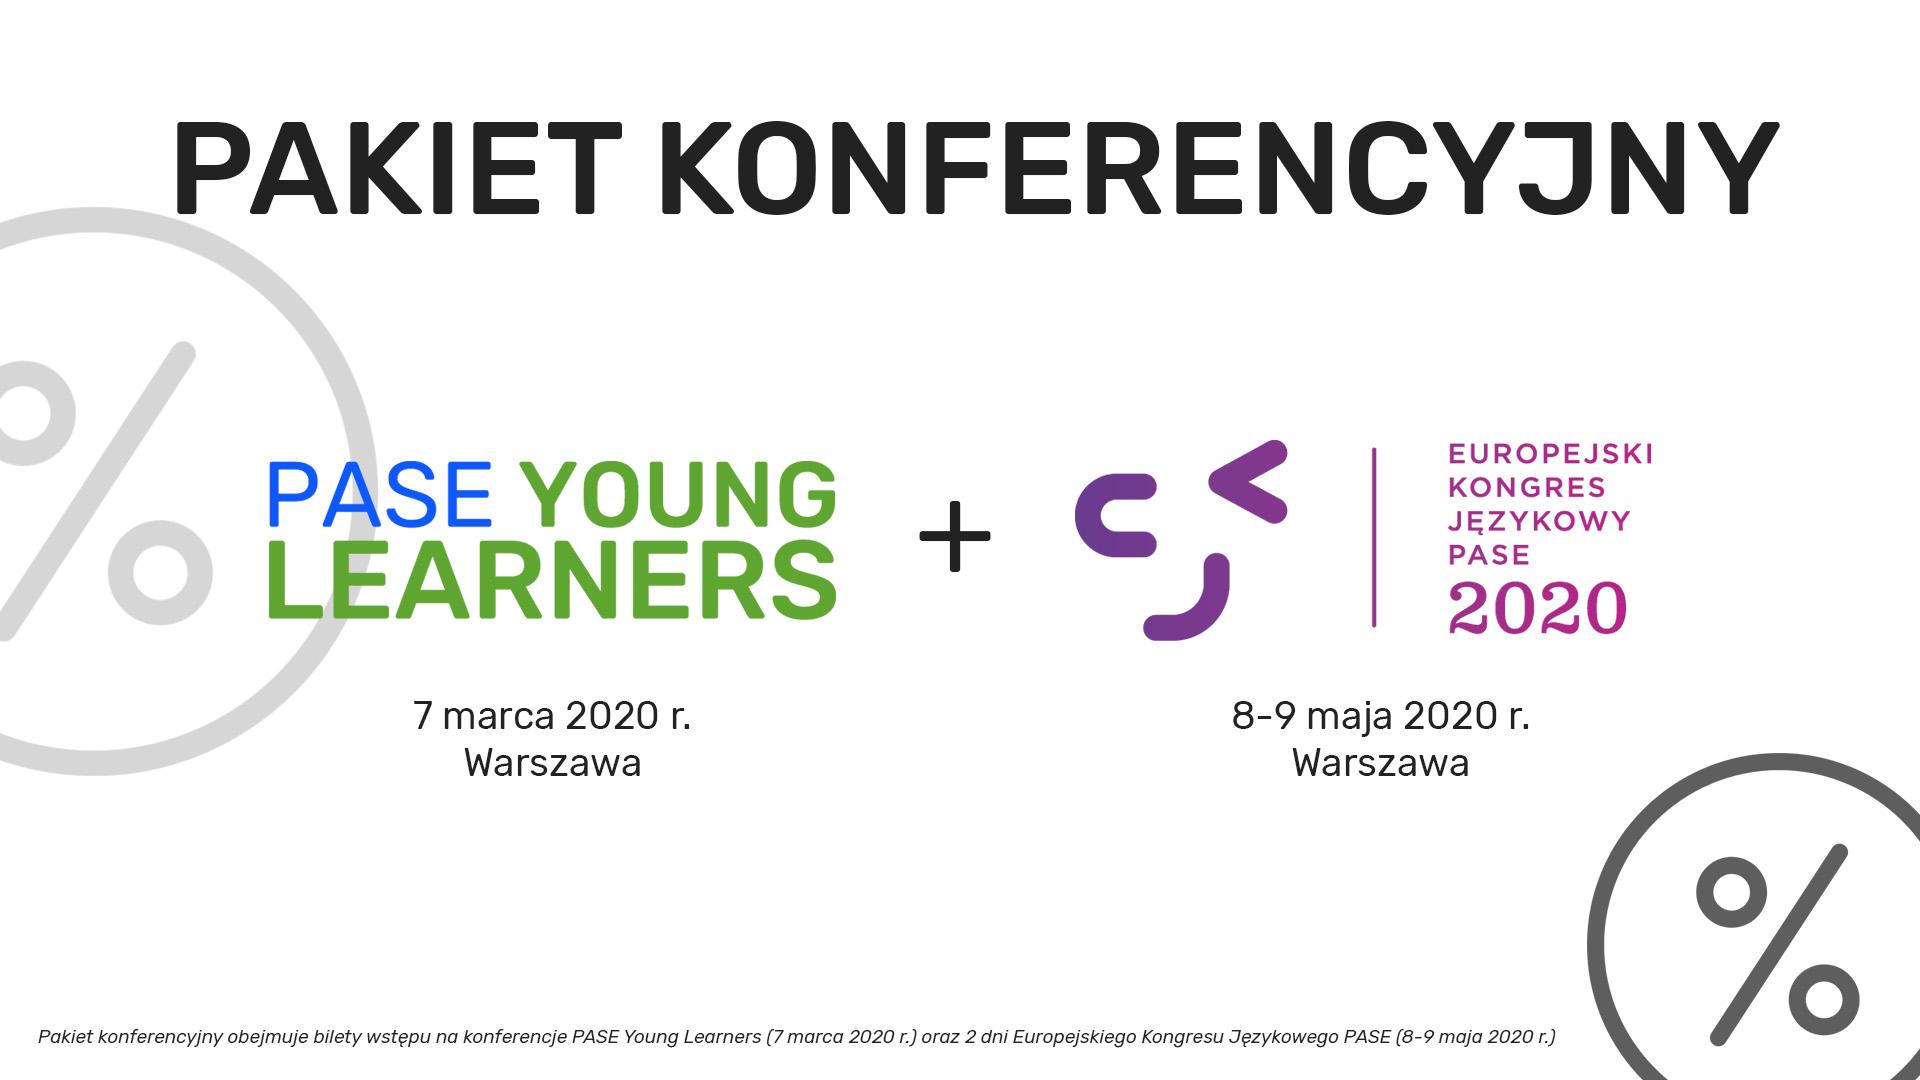 Pakiet konferencyjny: PASE Young Learners + Europejski Kongres Językowy PASE